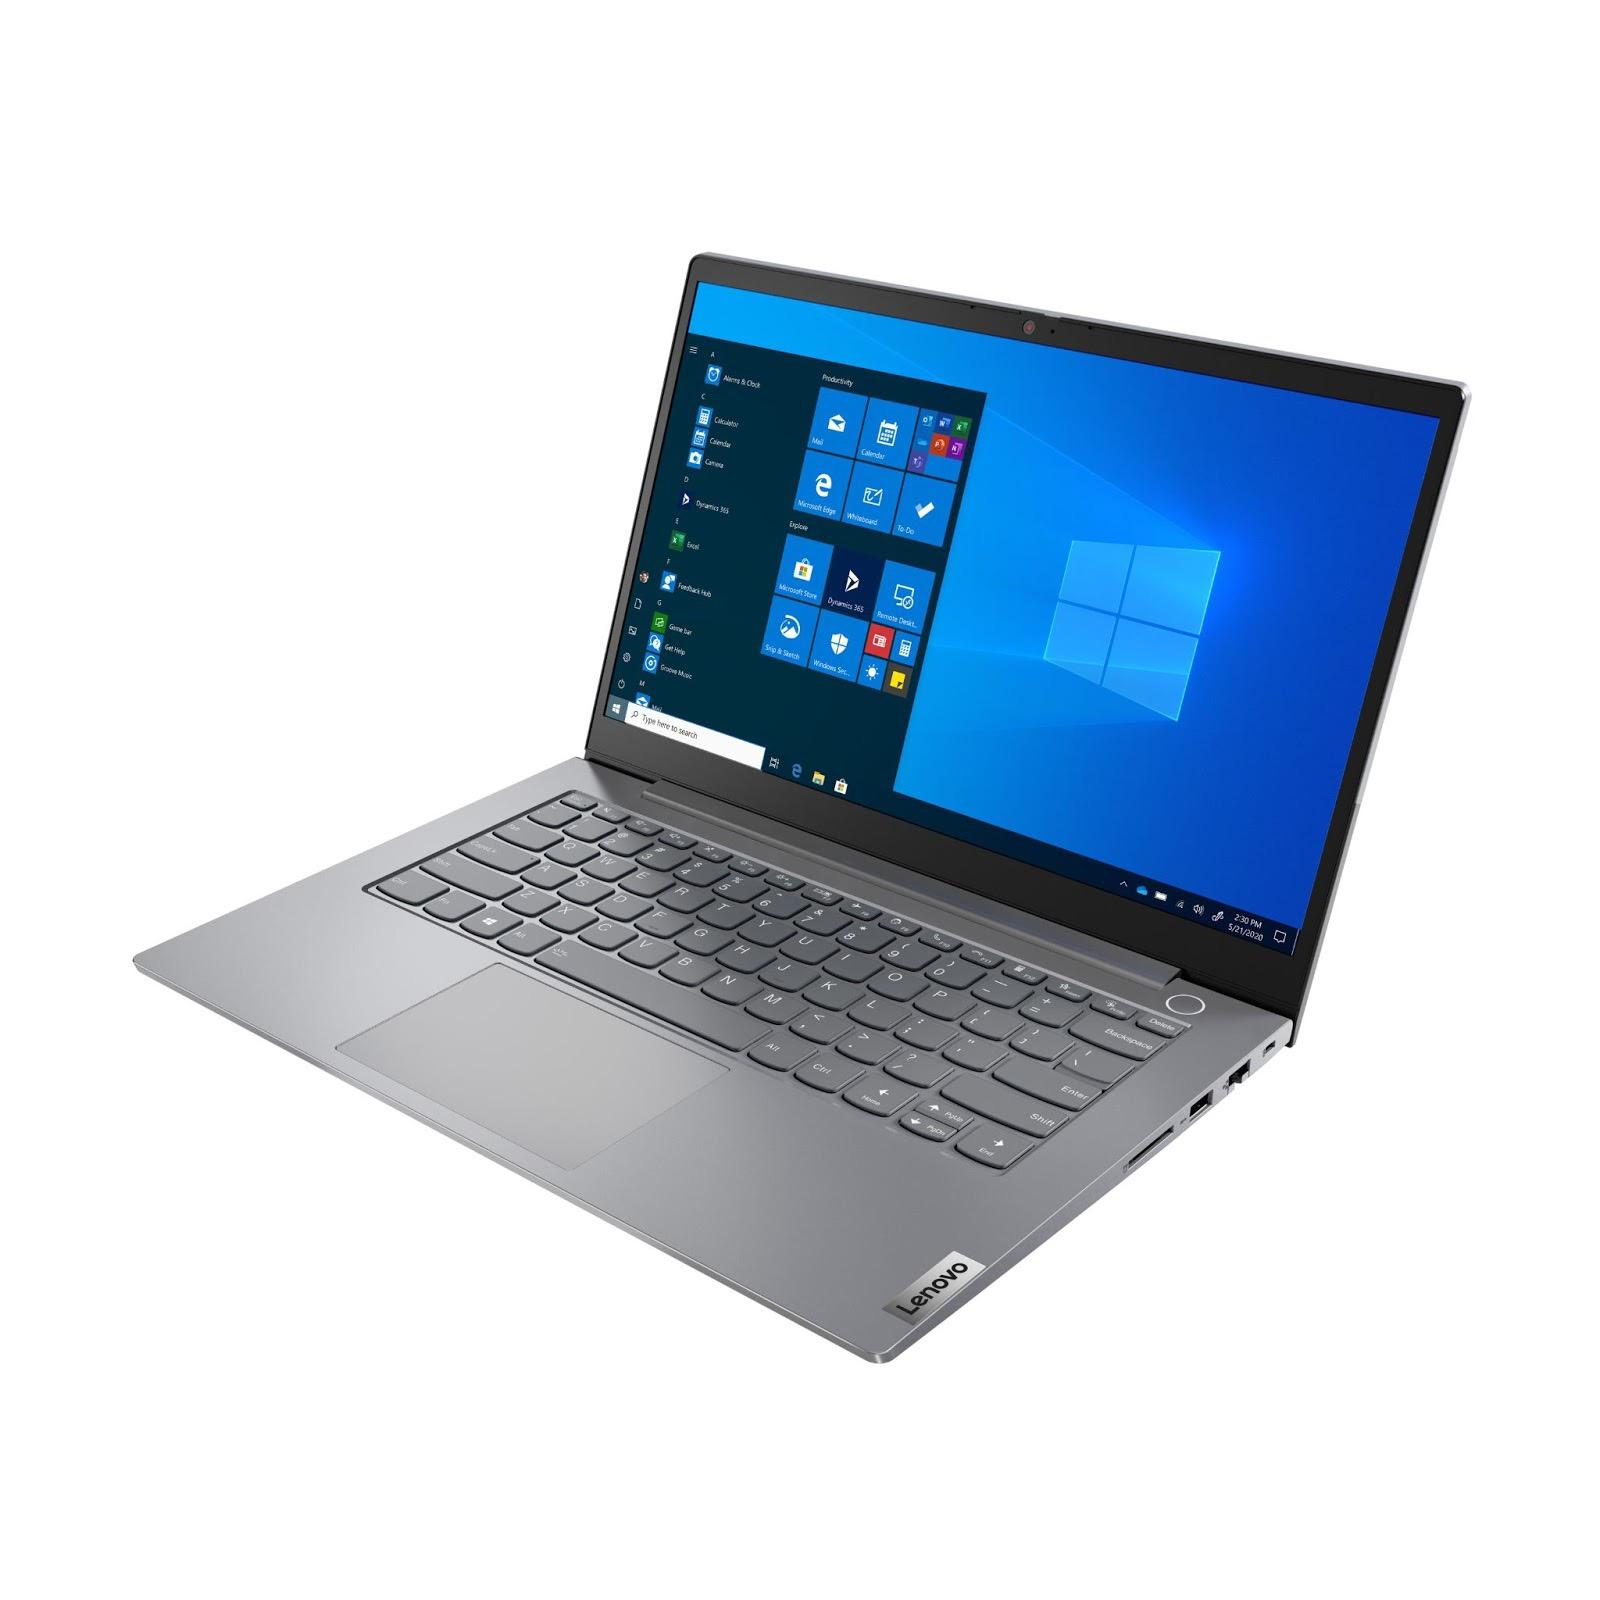 Фото 2. Ноутбук Lenovo ThinkBook 14 Gen 2 ITL Mineral Grey (20VD000BRU)